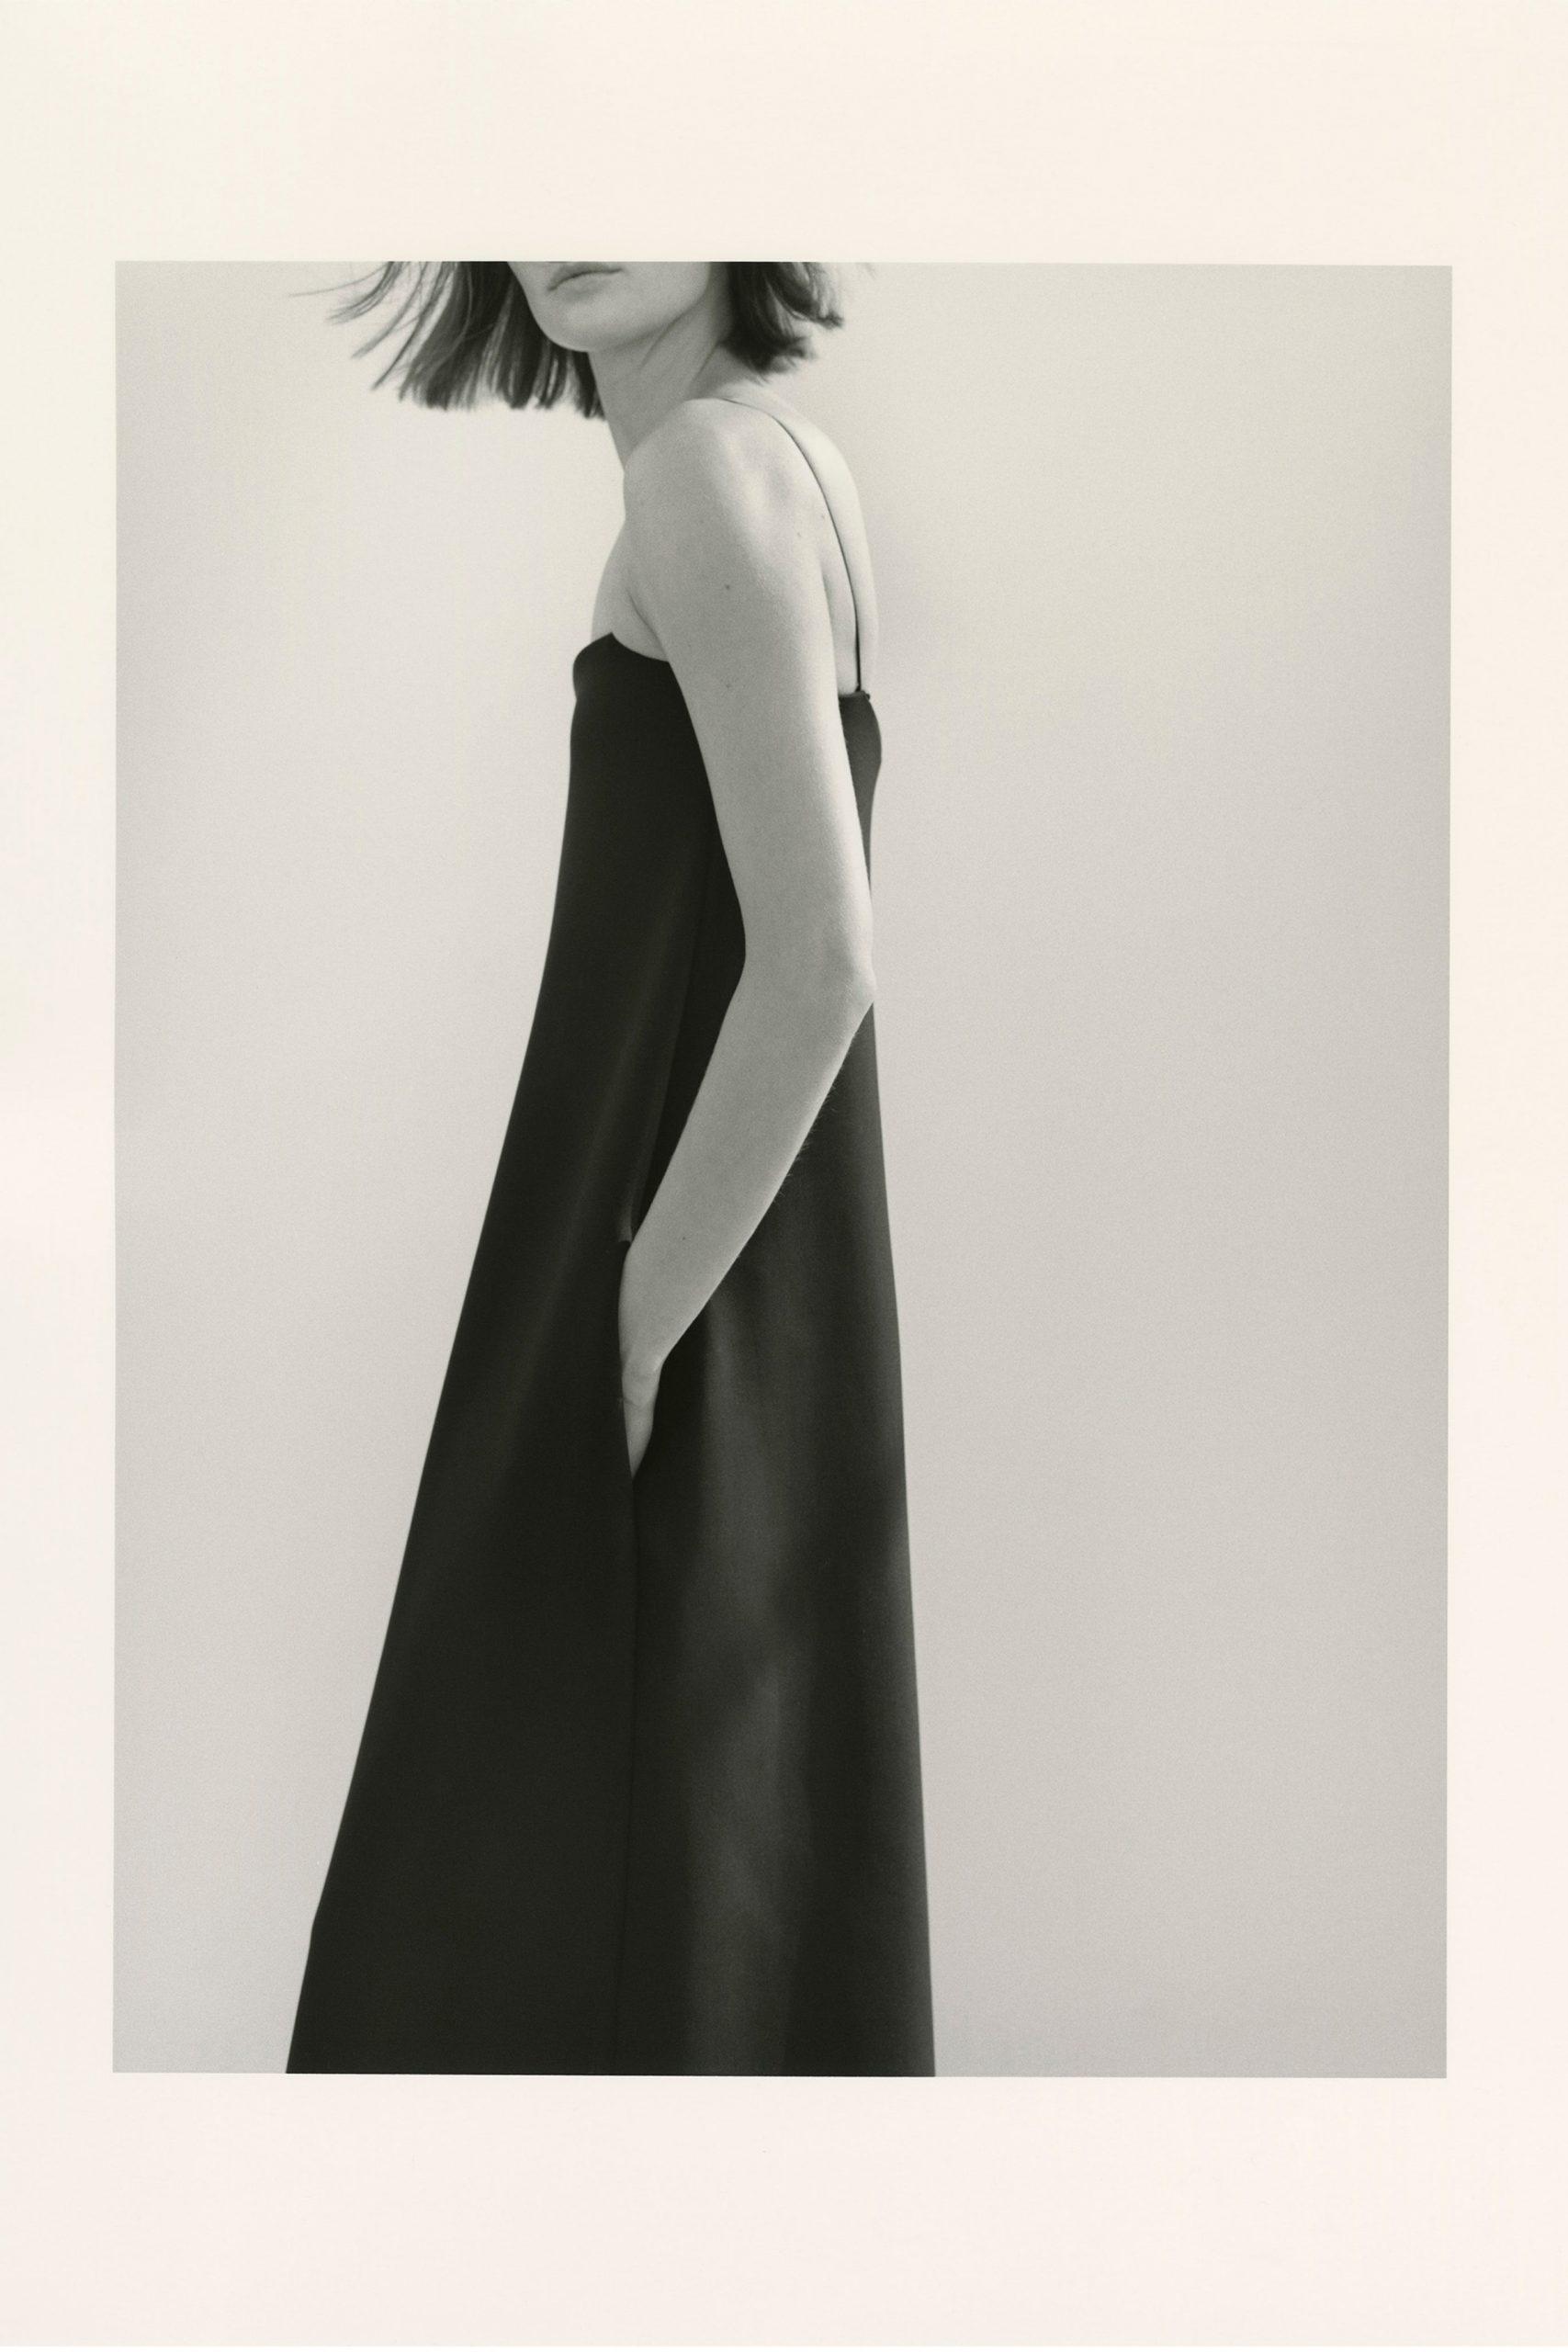 The Row Spring 2021 Fashion Show Photos